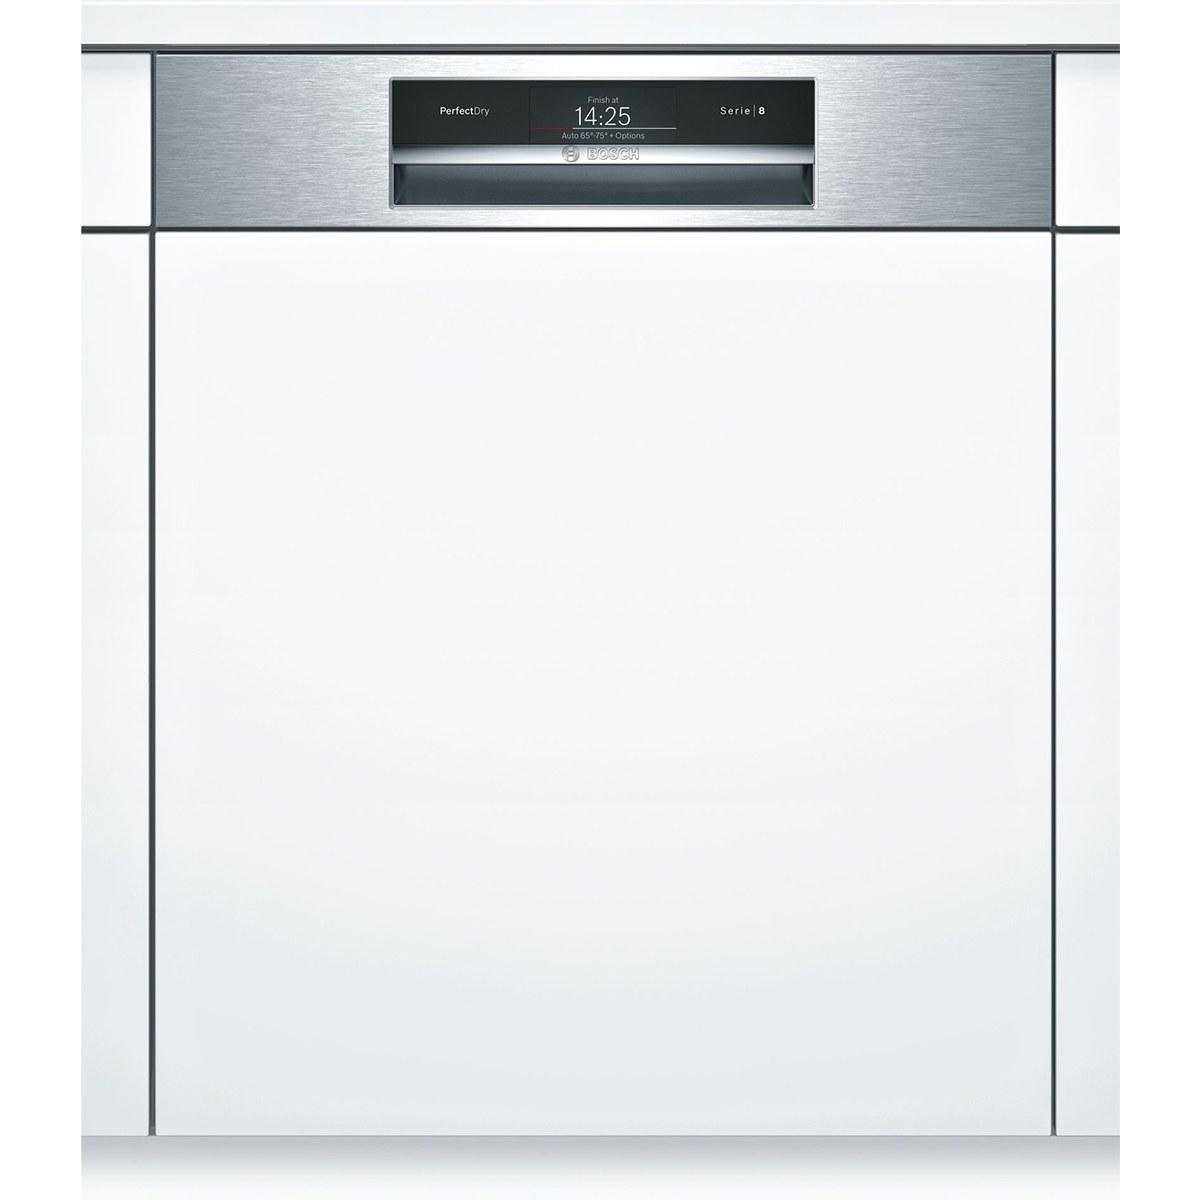 main images ماشین ظرفشویی بوش مدل SMI88TS02B ظرفیت 14 نفره Bosch SMI88TS02B Dishwasher